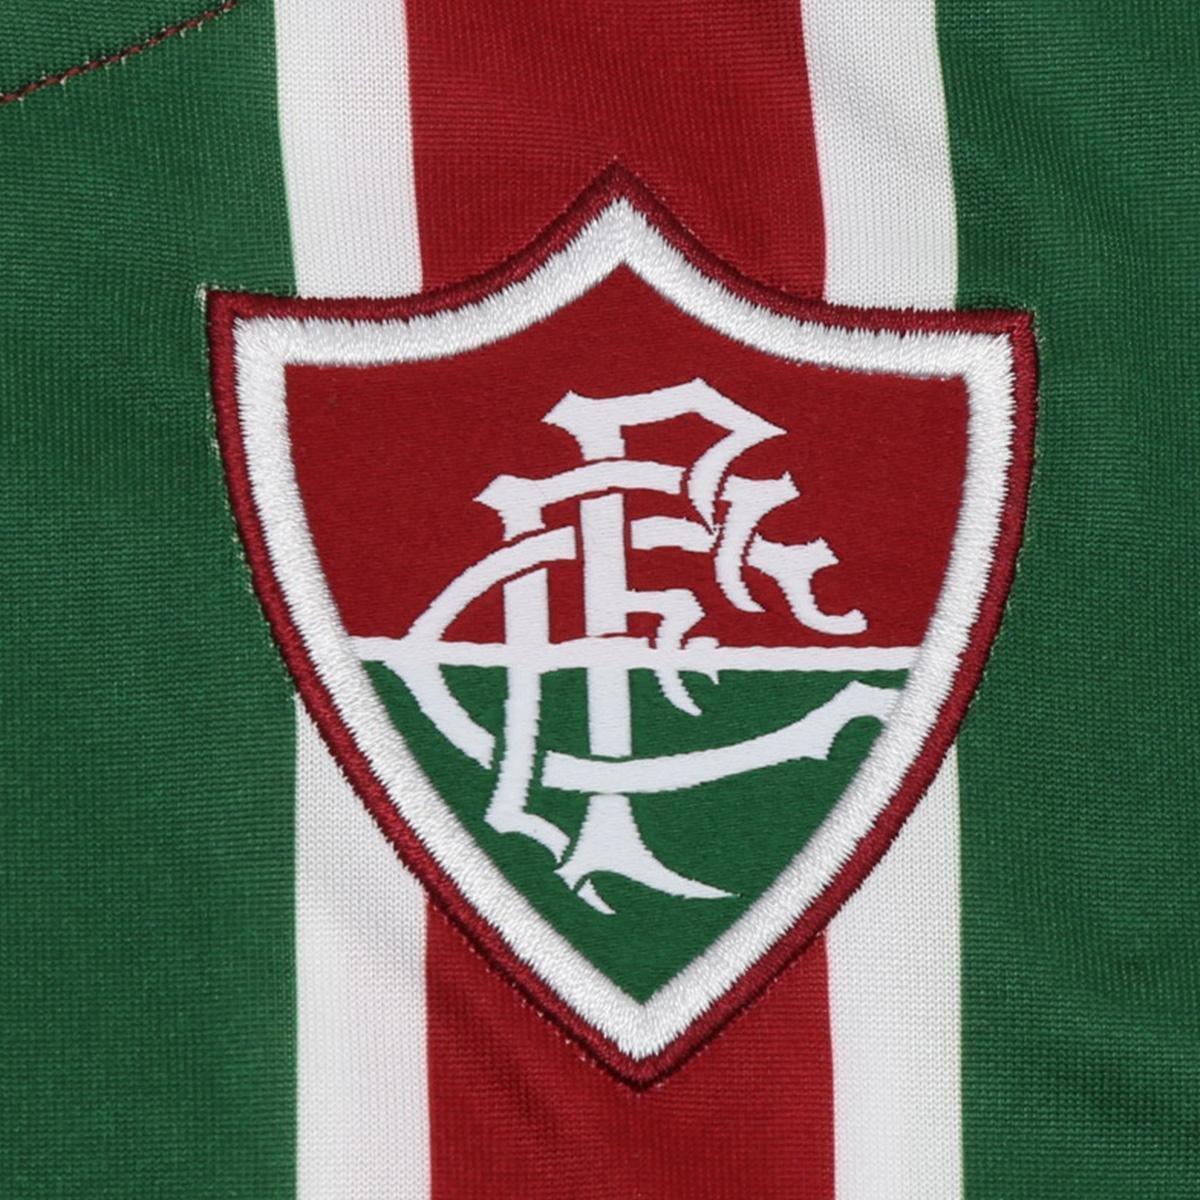 ... Camisa Fluminense I 17 18 s nº Torcedor Under Armour Feminina ... 930dfcde92d03